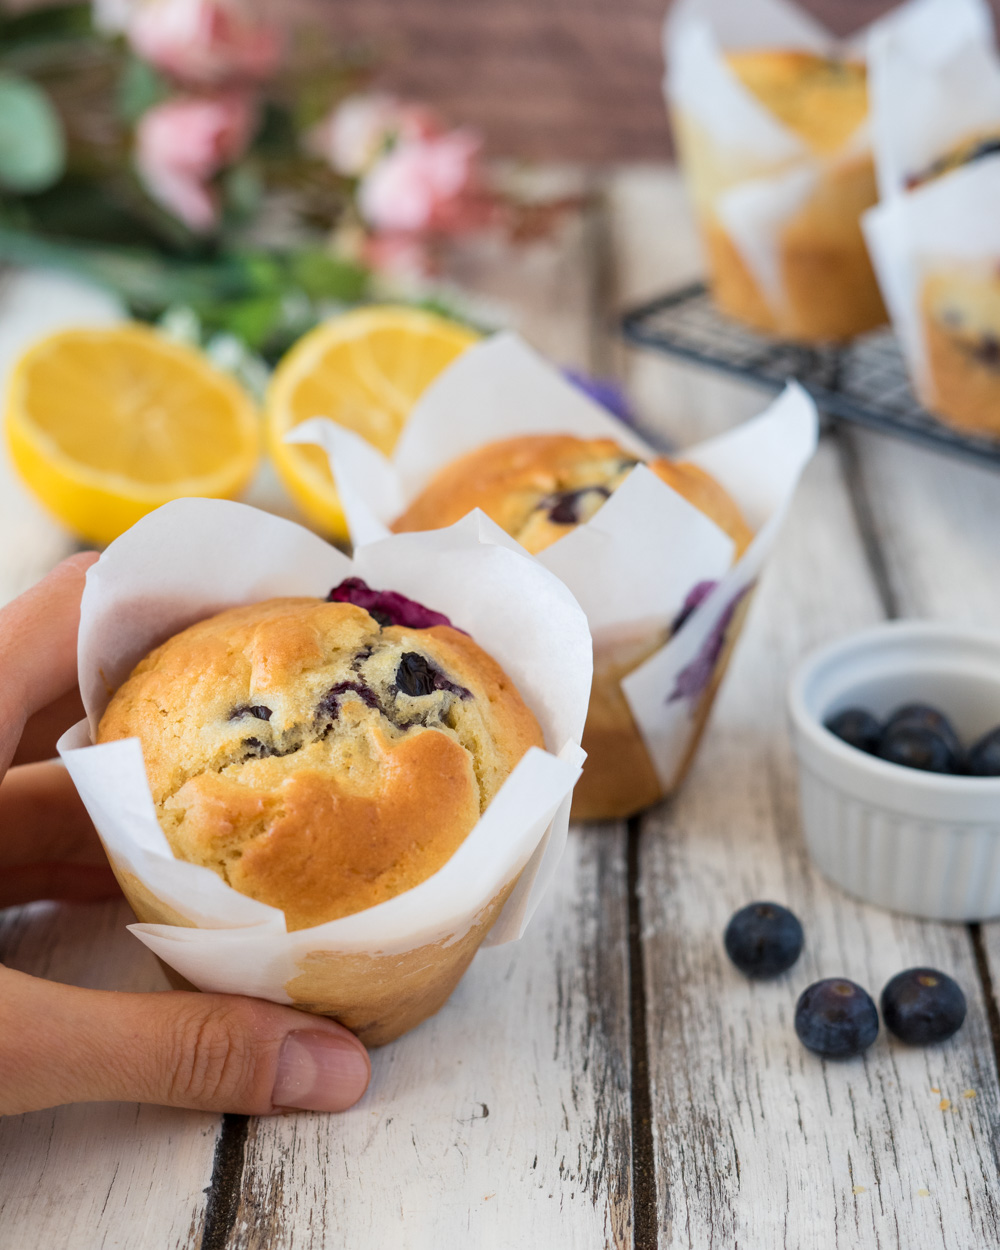 Blueberry muffin al limone e yogurt